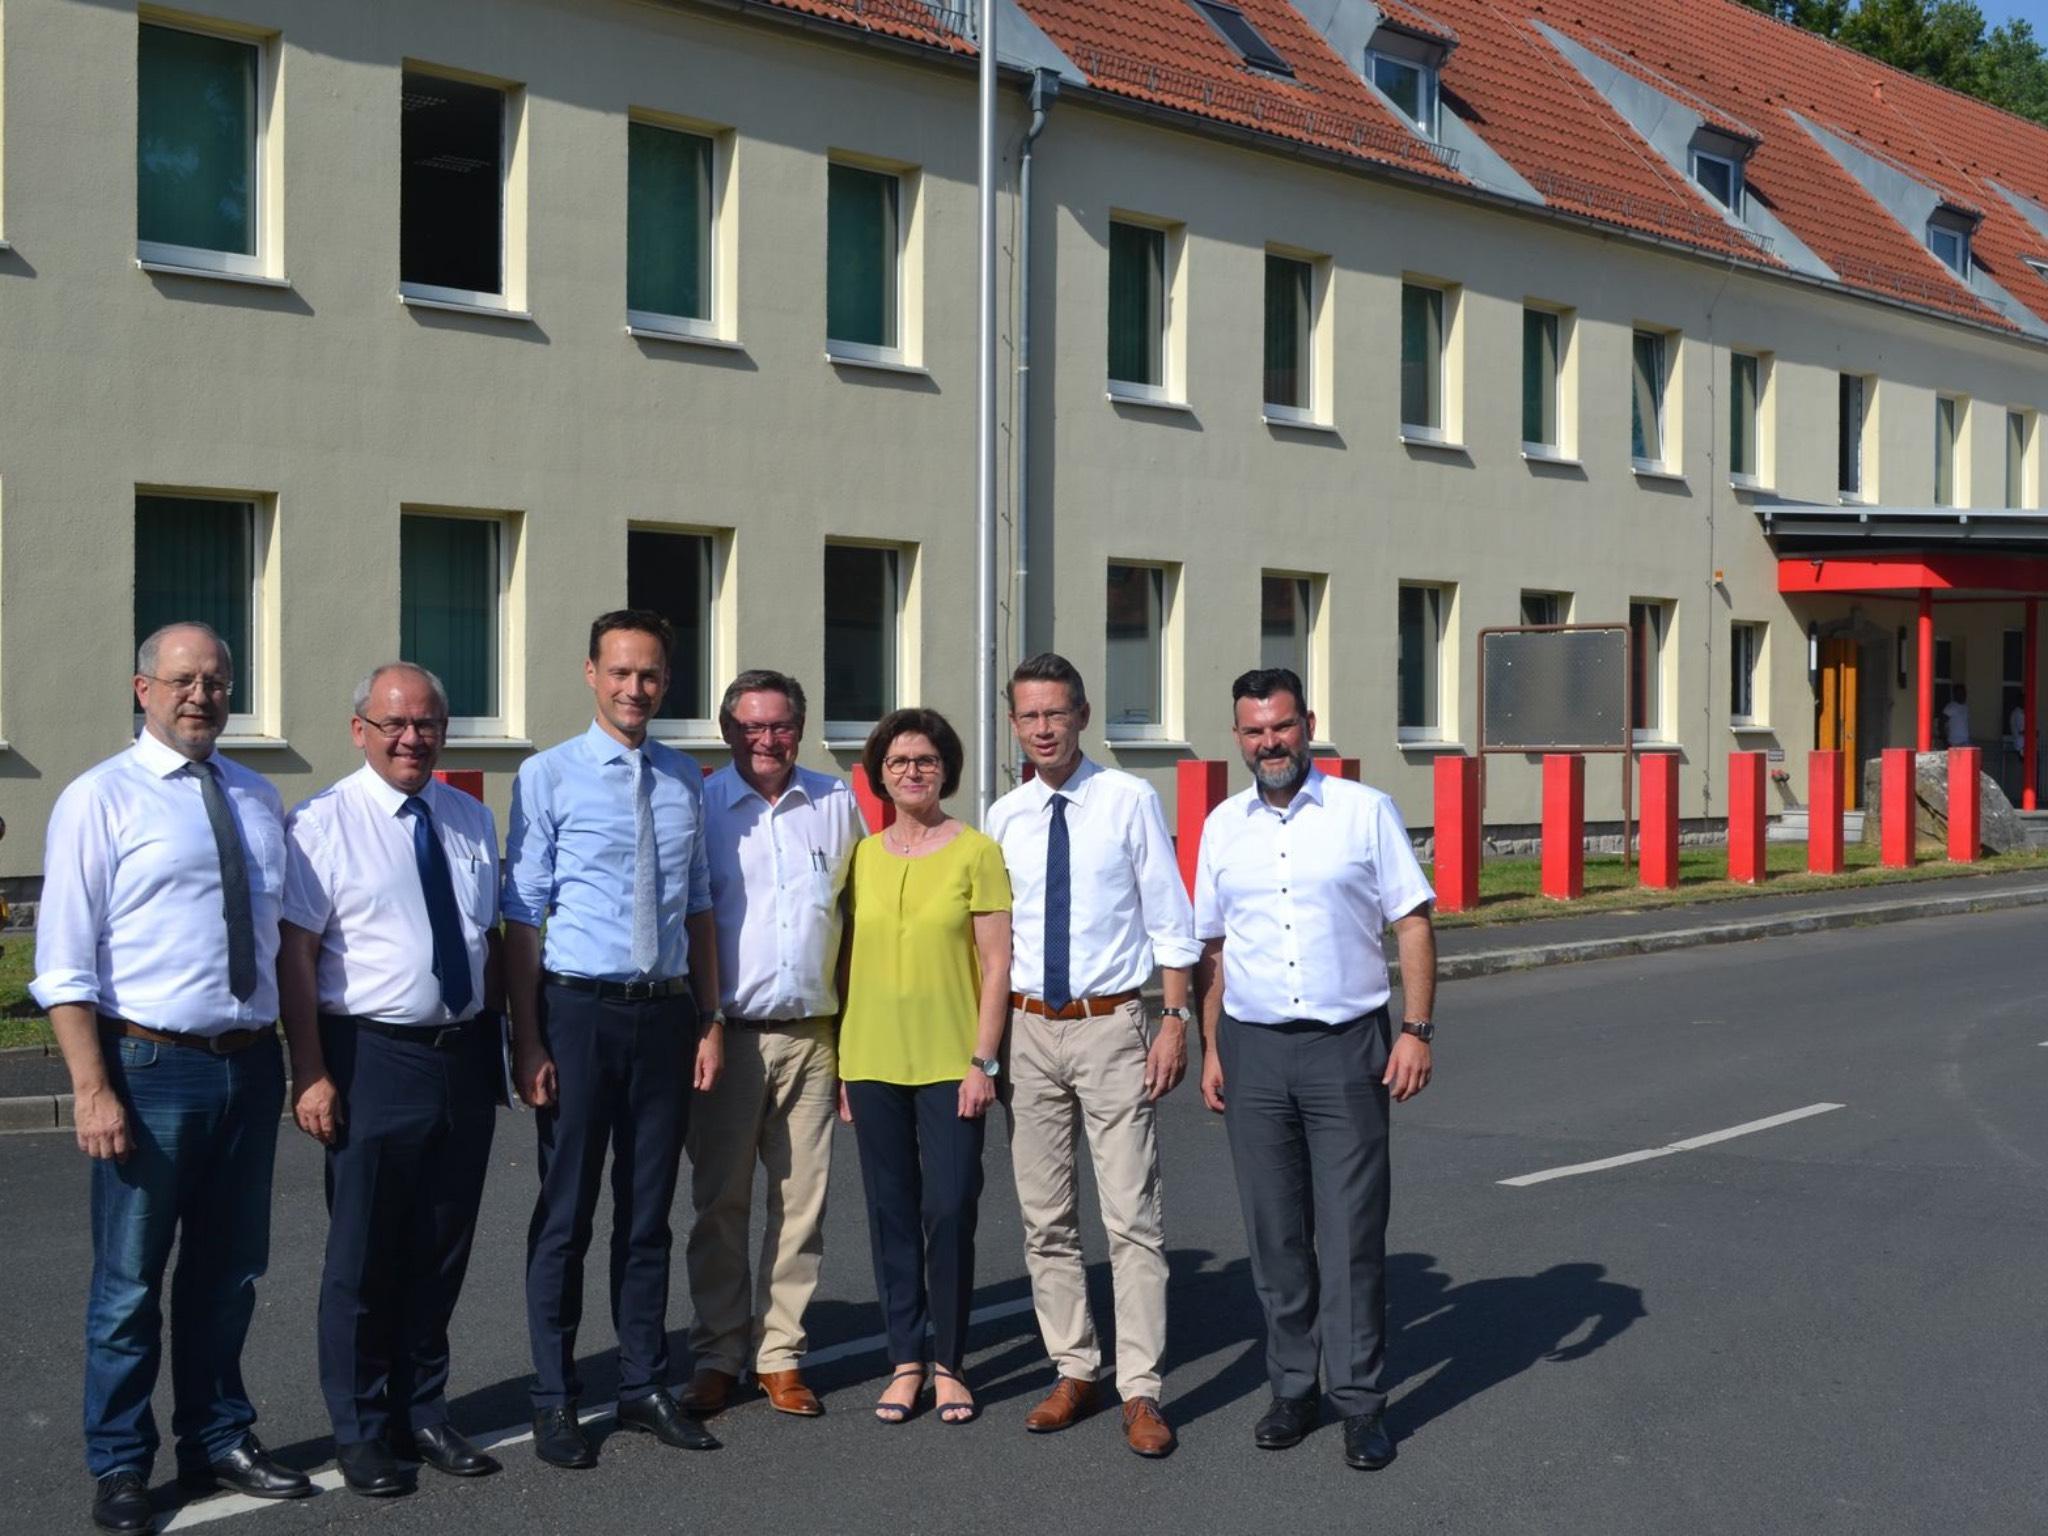 Vor-Ort-Termin in den Conn Barracks. Foto: ZV Conn Barracks, Tobias Blesch